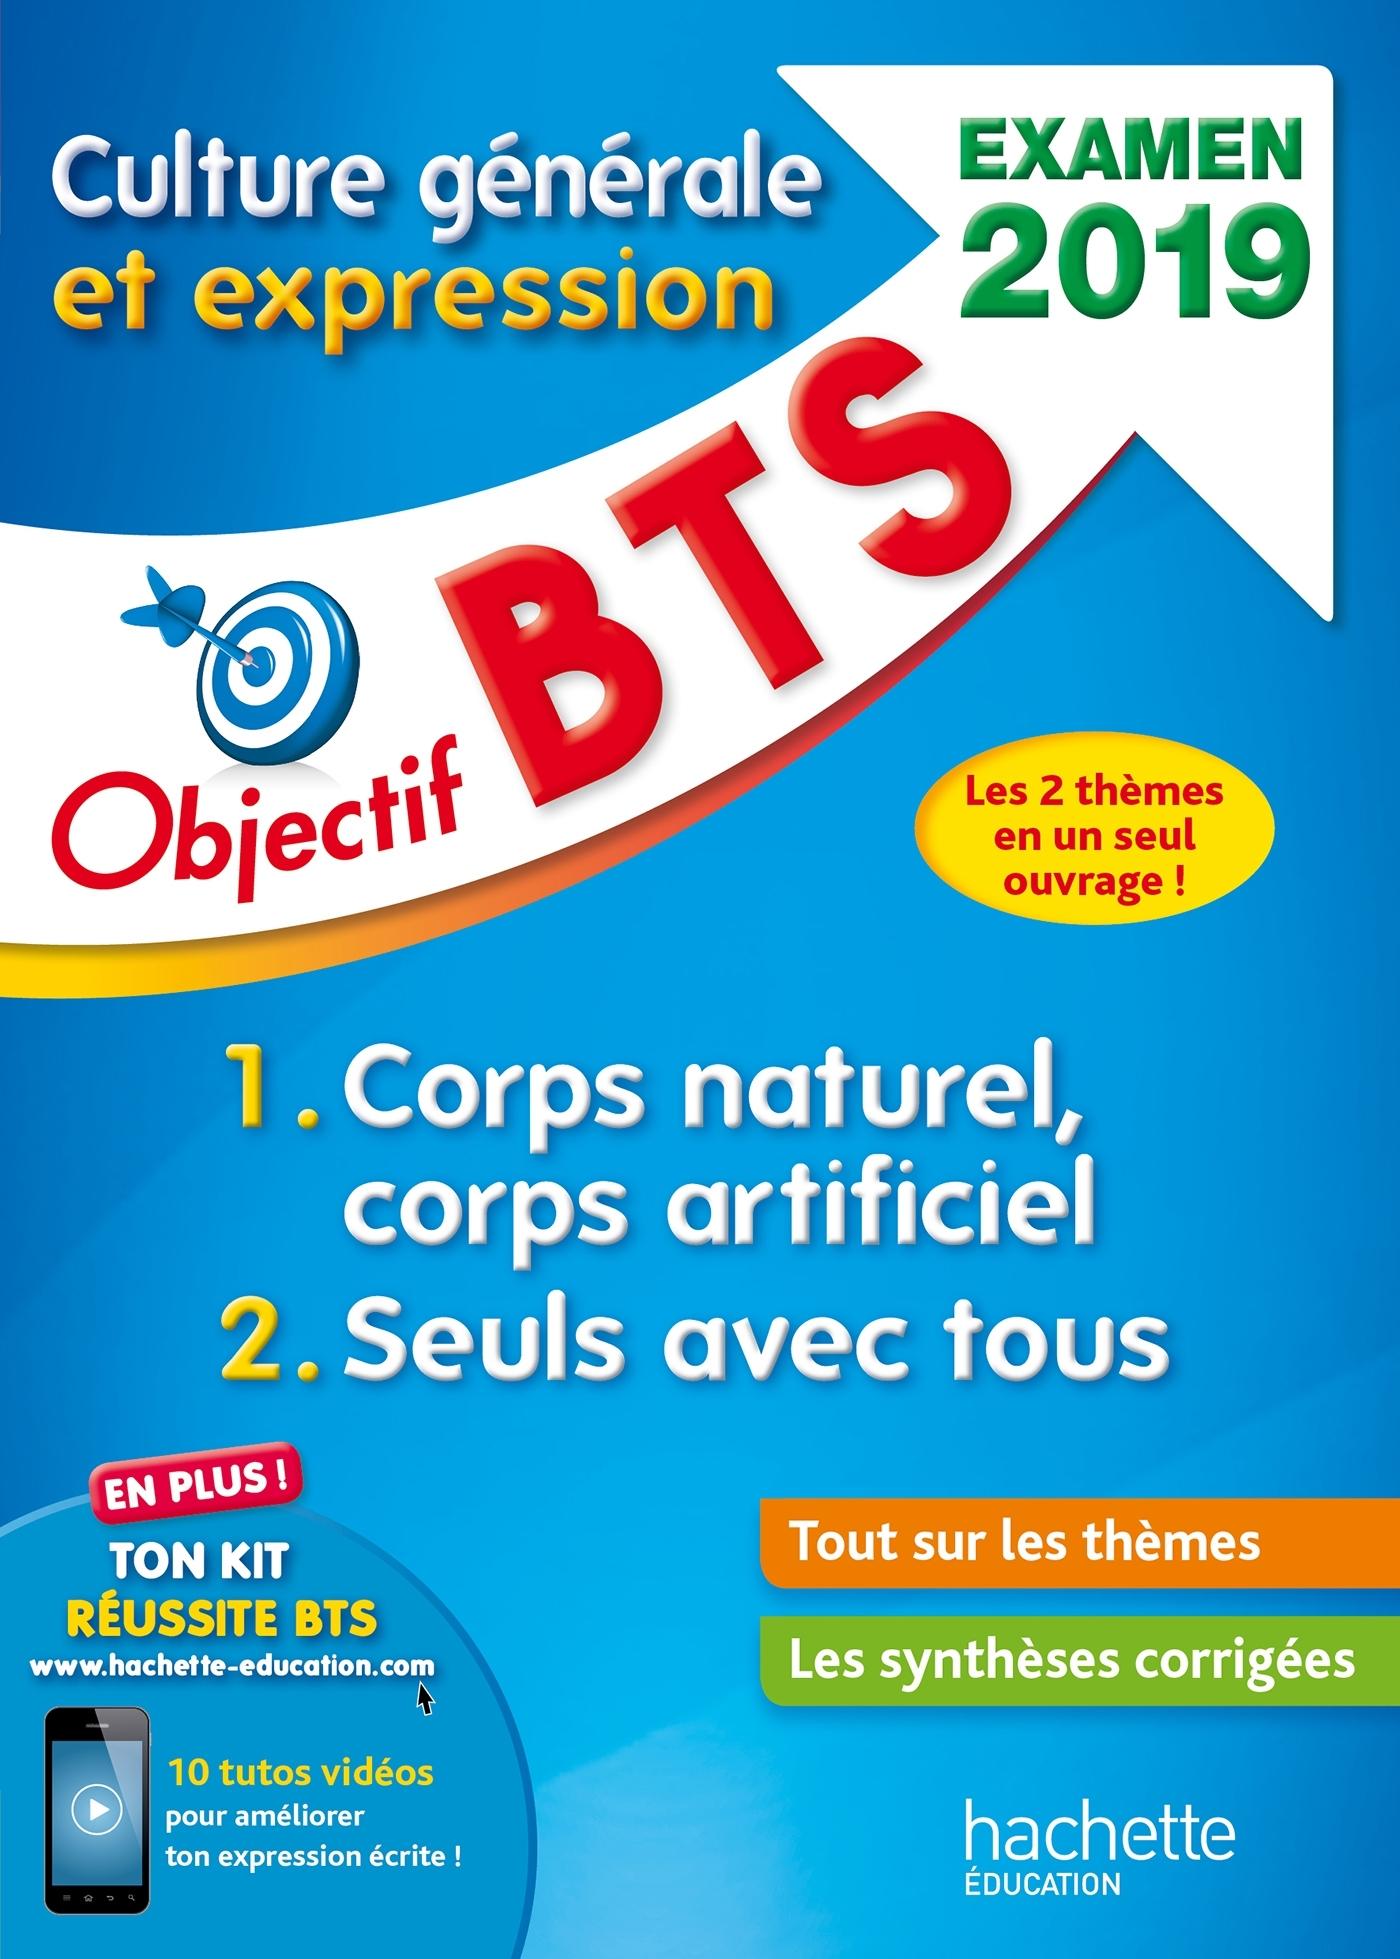 OBJECTIF BTS CULTURE GENERALE ET EXPRESSION, EXAMEN 2019